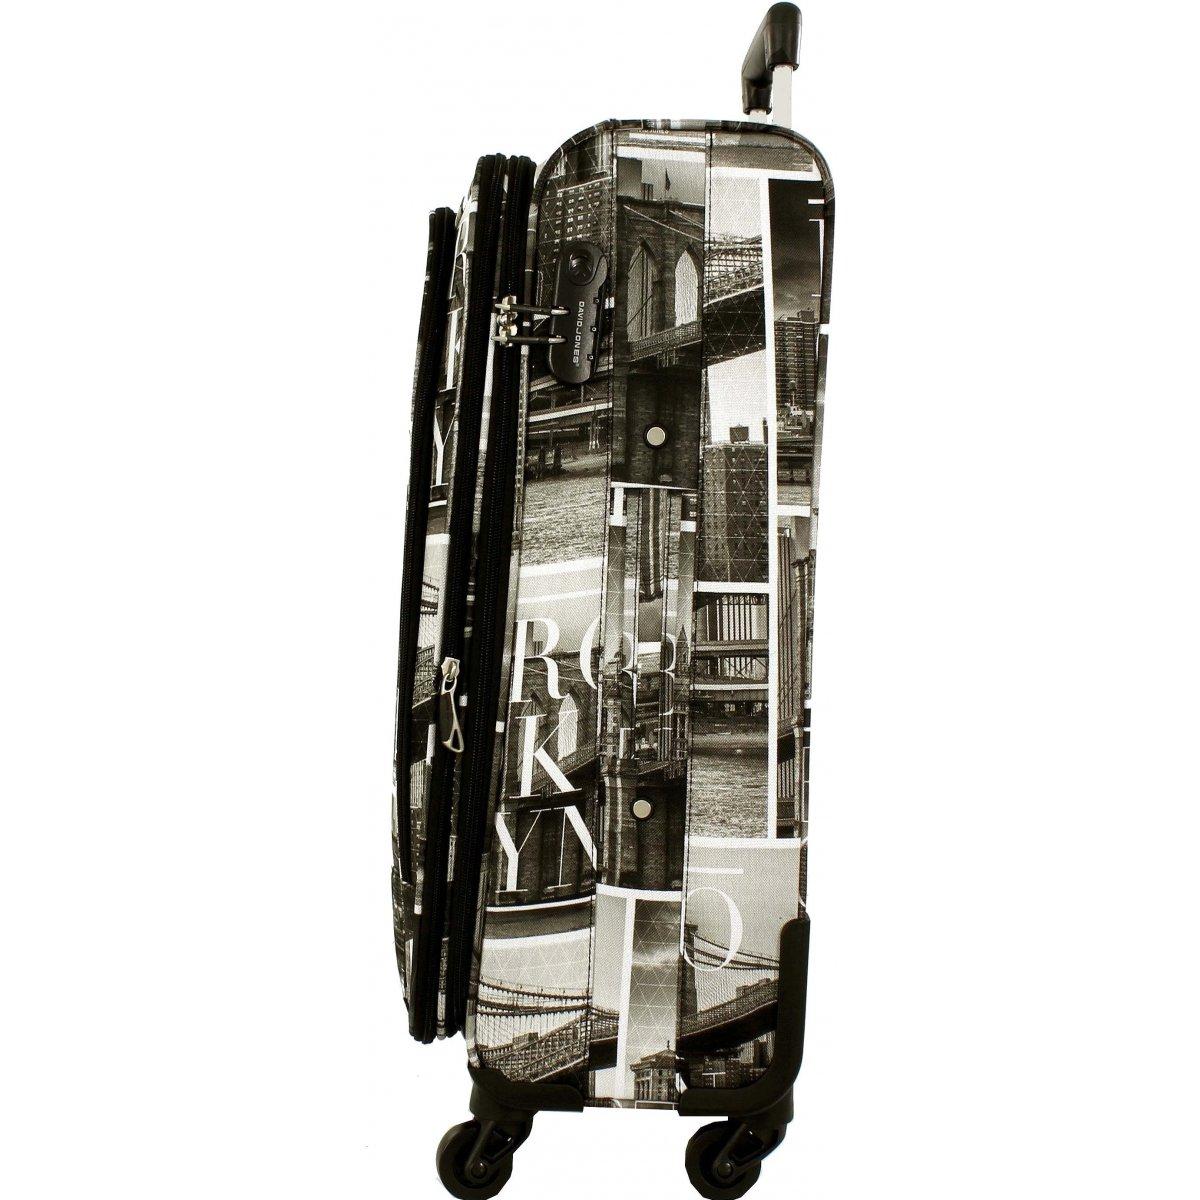 valise souple david jones taille m 66cm ba50271m couleur principale brooklyn solde. Black Bedroom Furniture Sets. Home Design Ideas